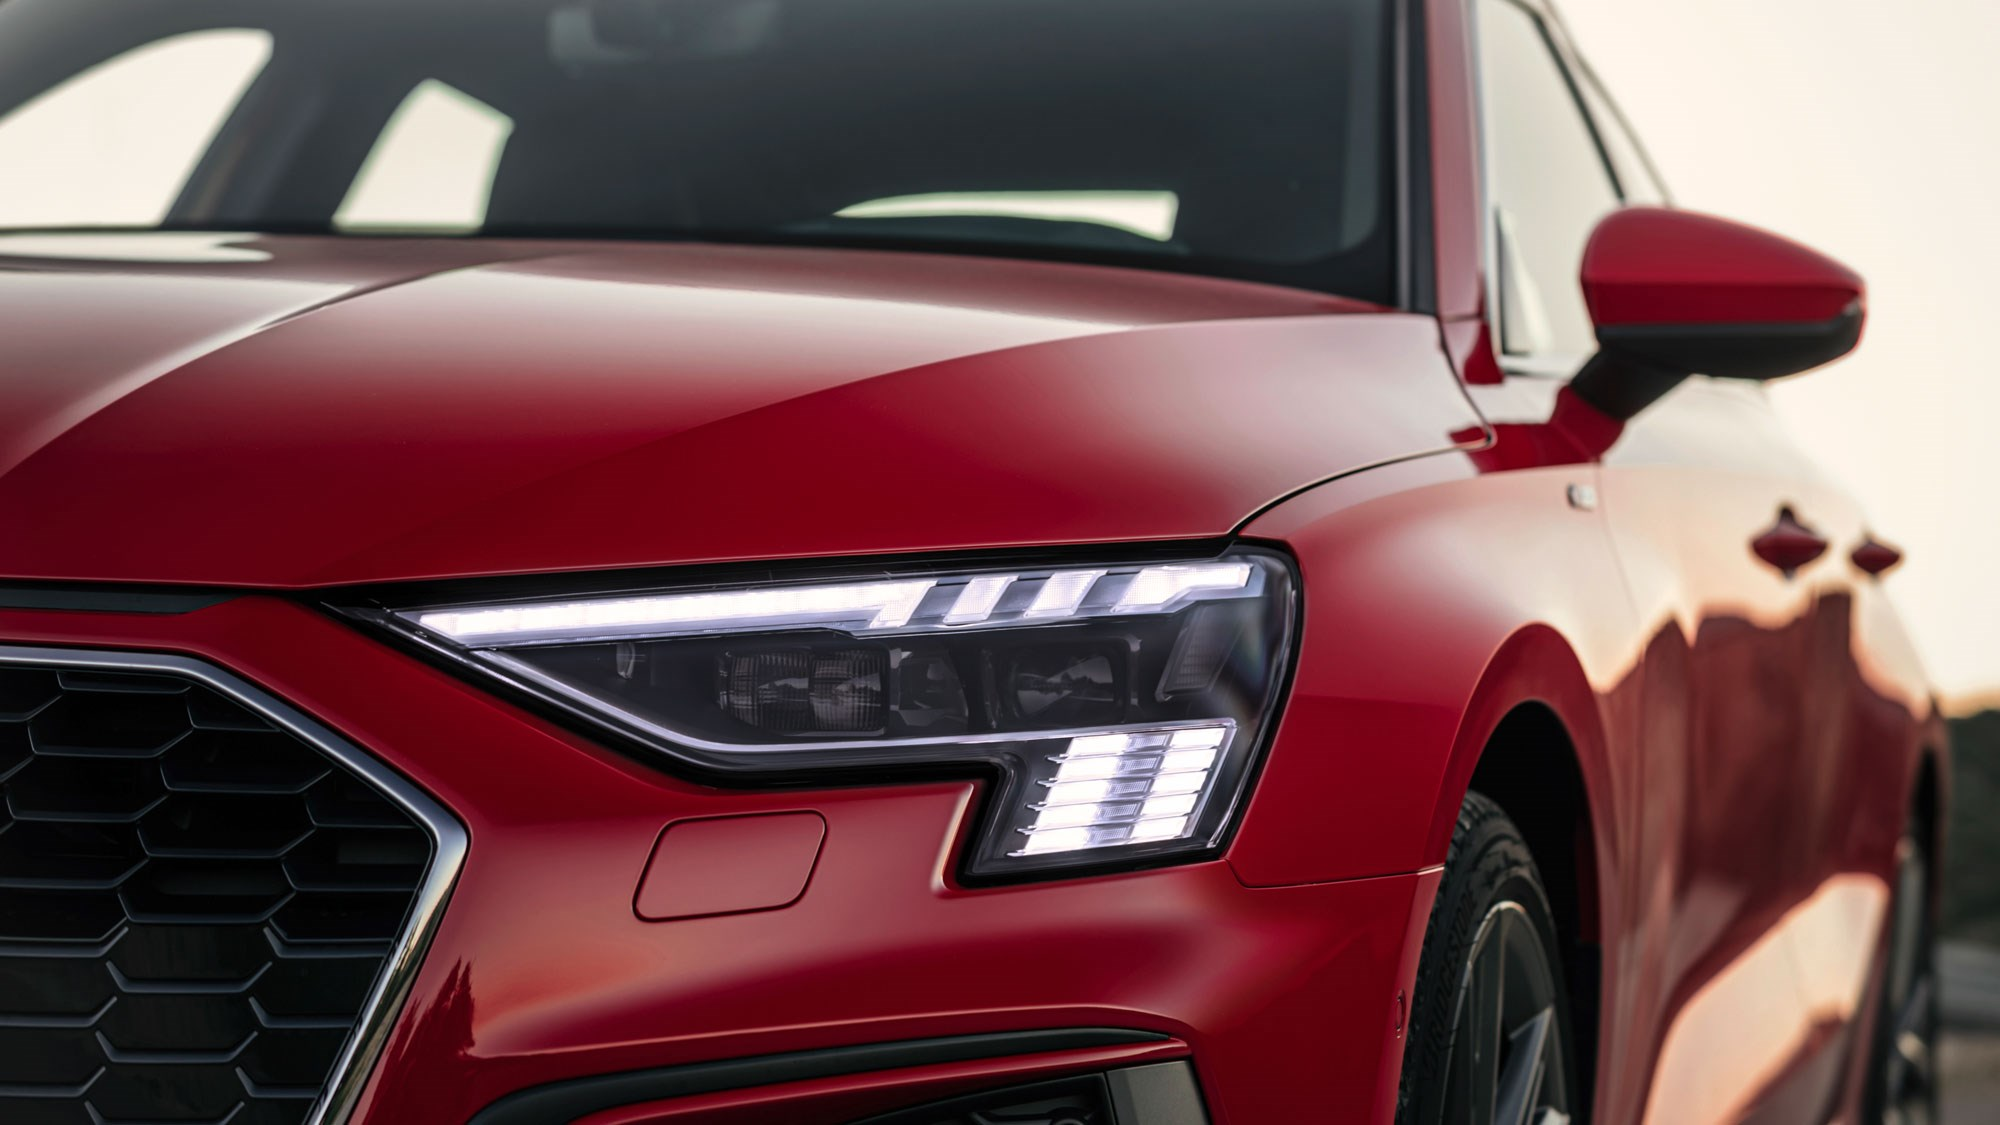 New Audi A3 Sportback headlamps detail